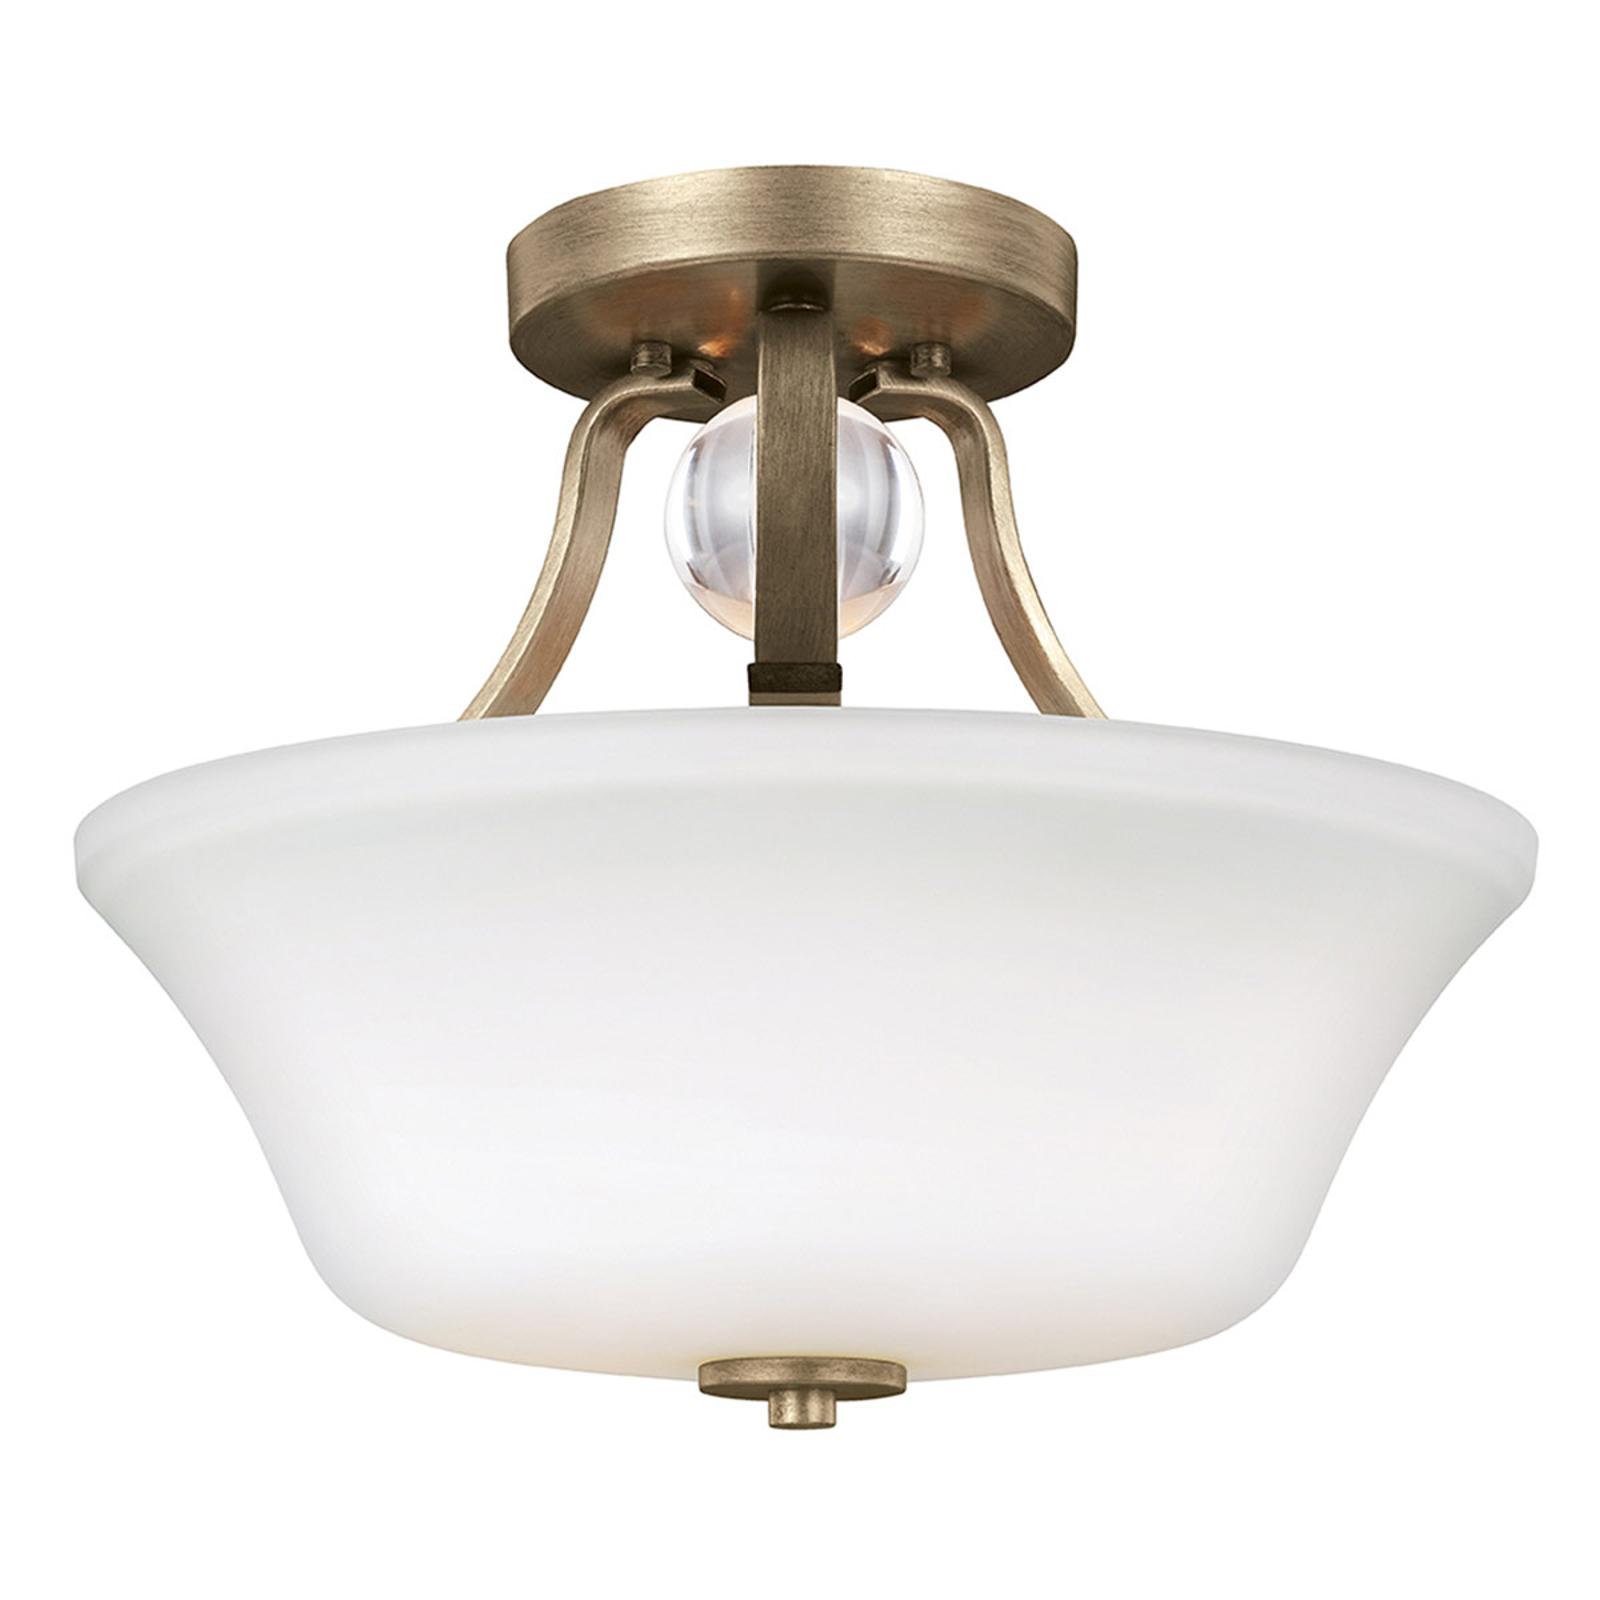 Lampa sufitowa Evington, złota